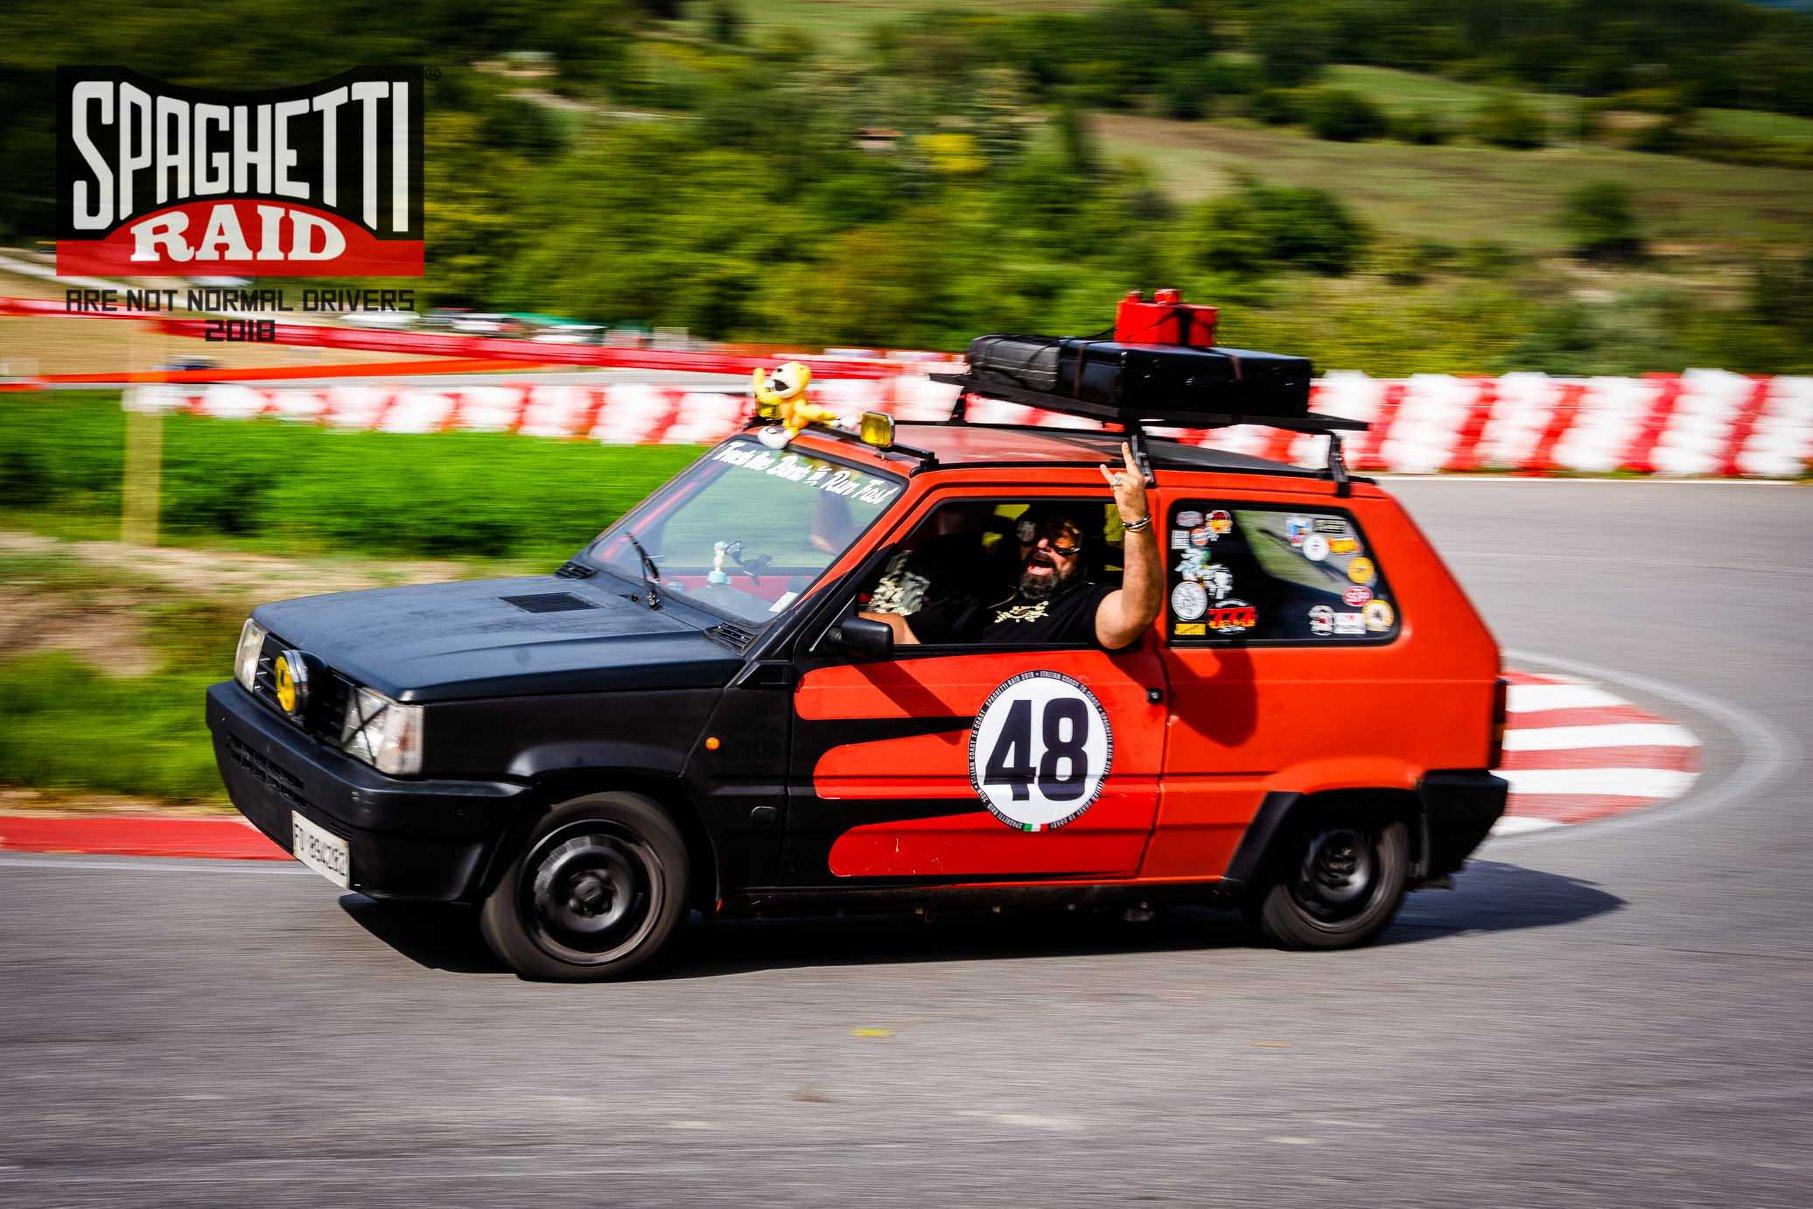 Team FUCK THE BANK #48 Fiat Panda 1000cc del '94 Città: Senza fissa dimora